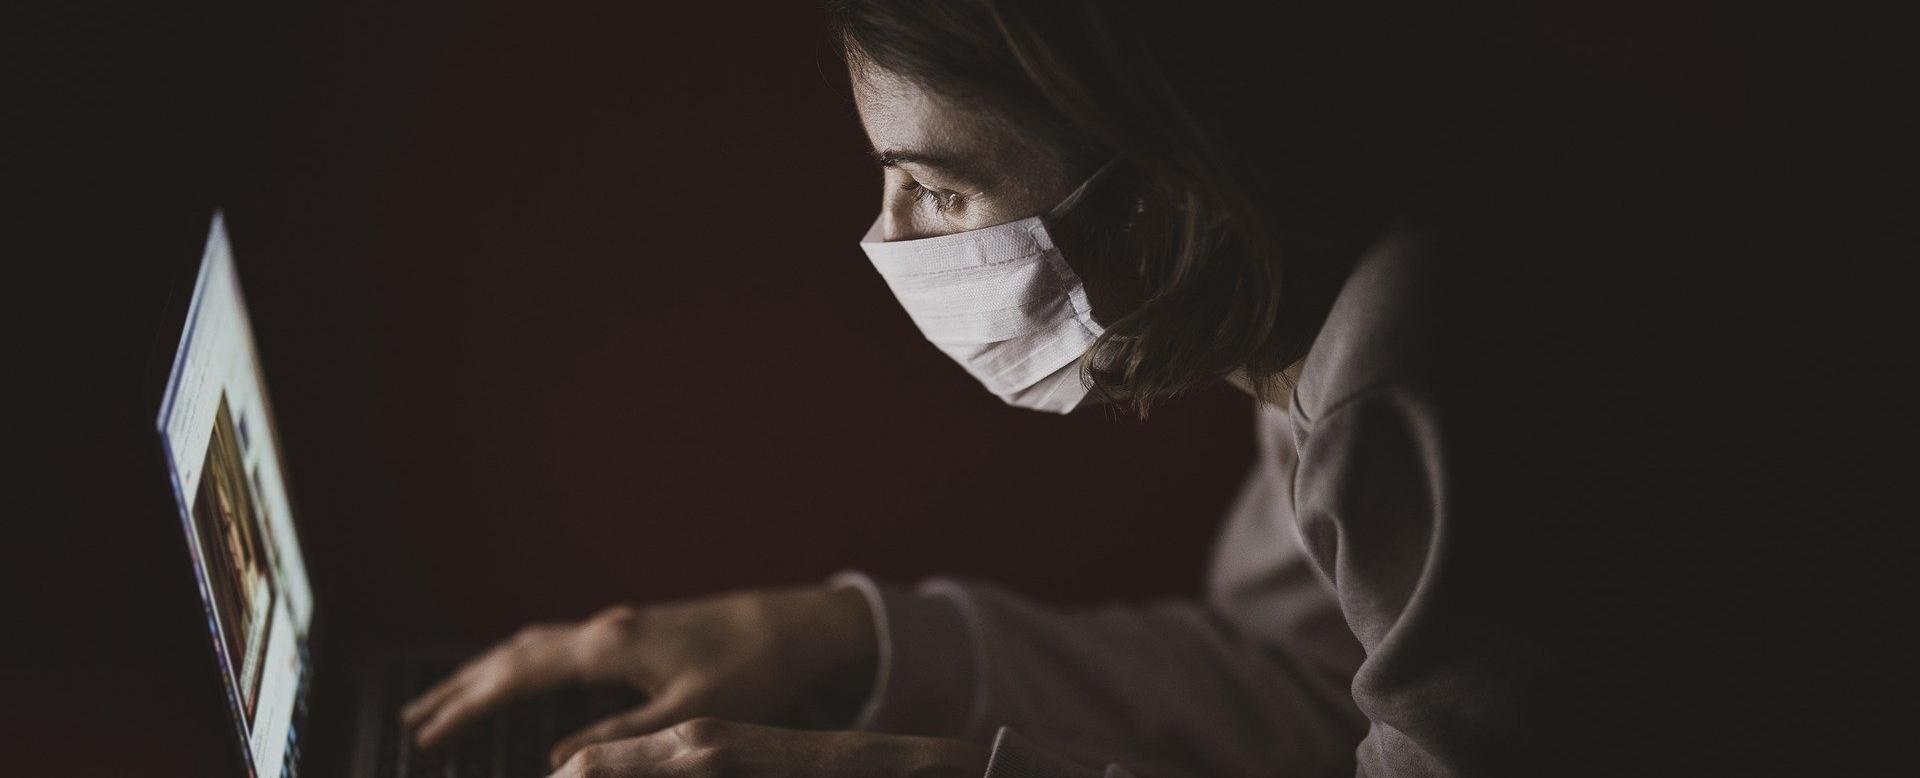 Human Factor: Phishing-Schutz statt Corona-Panik